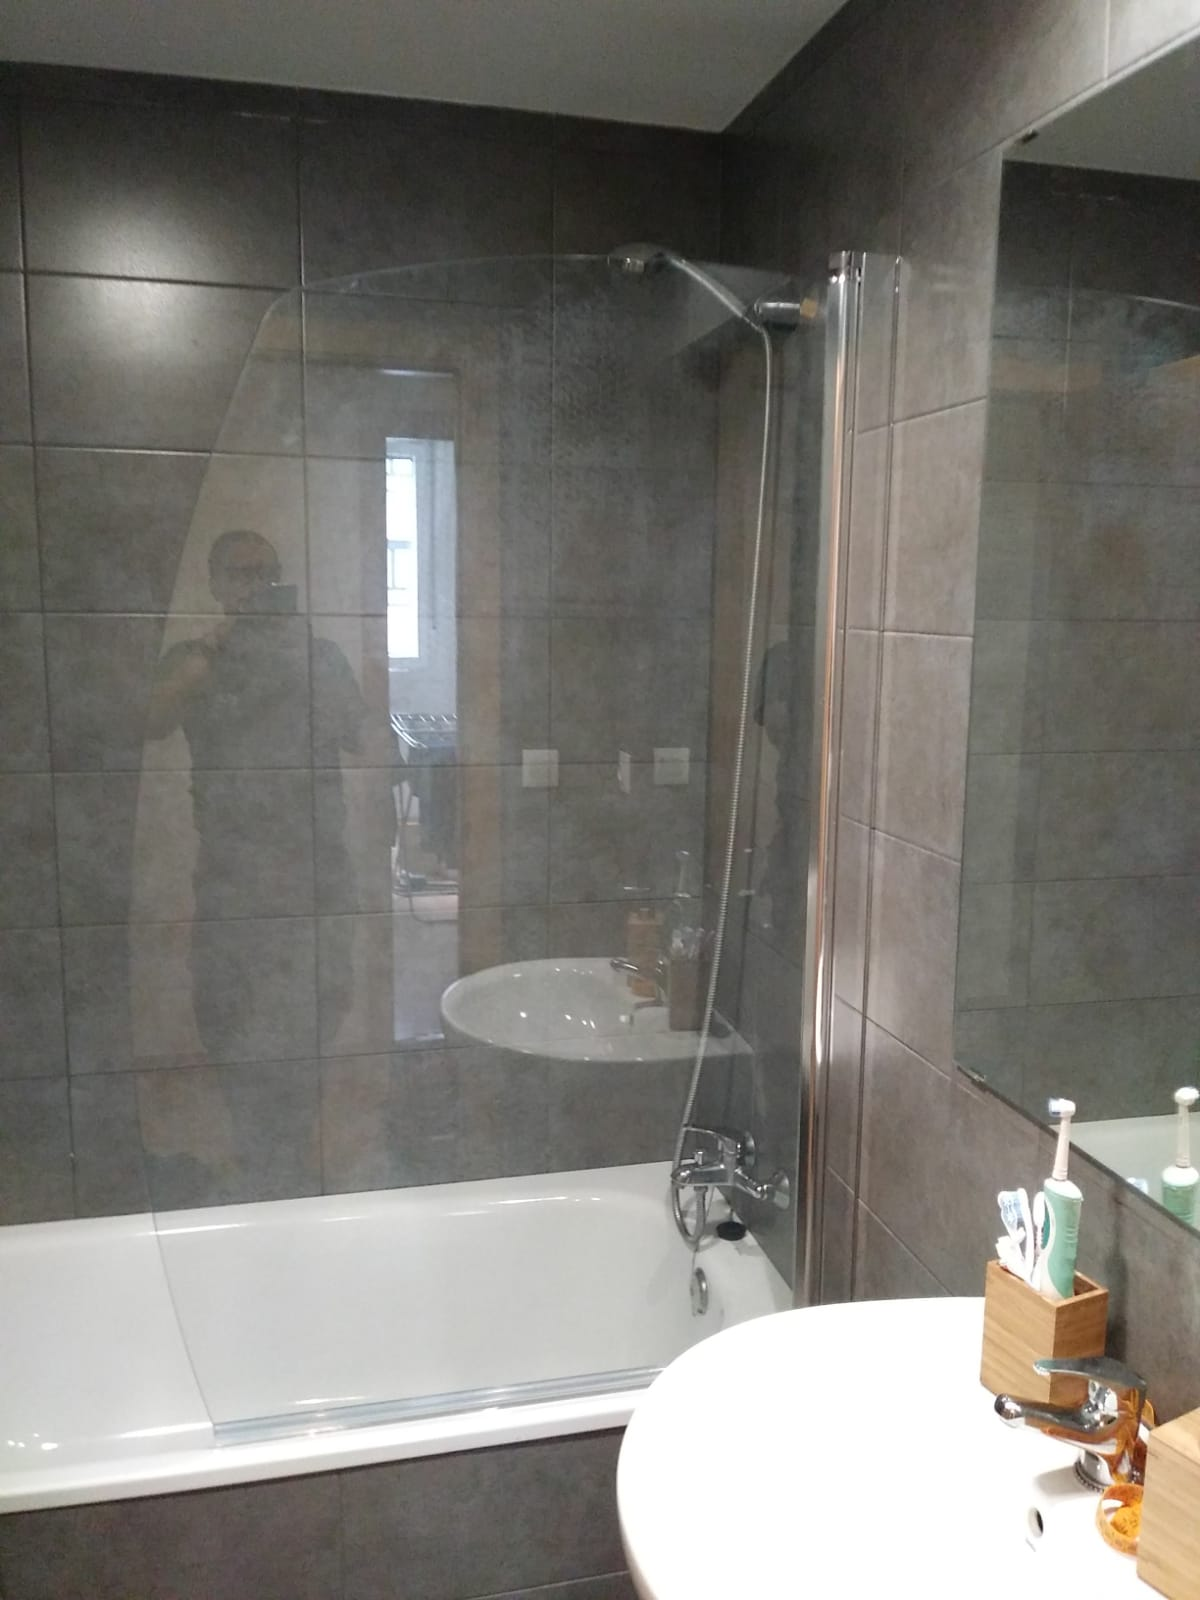 Mamparas de bañera a medida en Bilbao